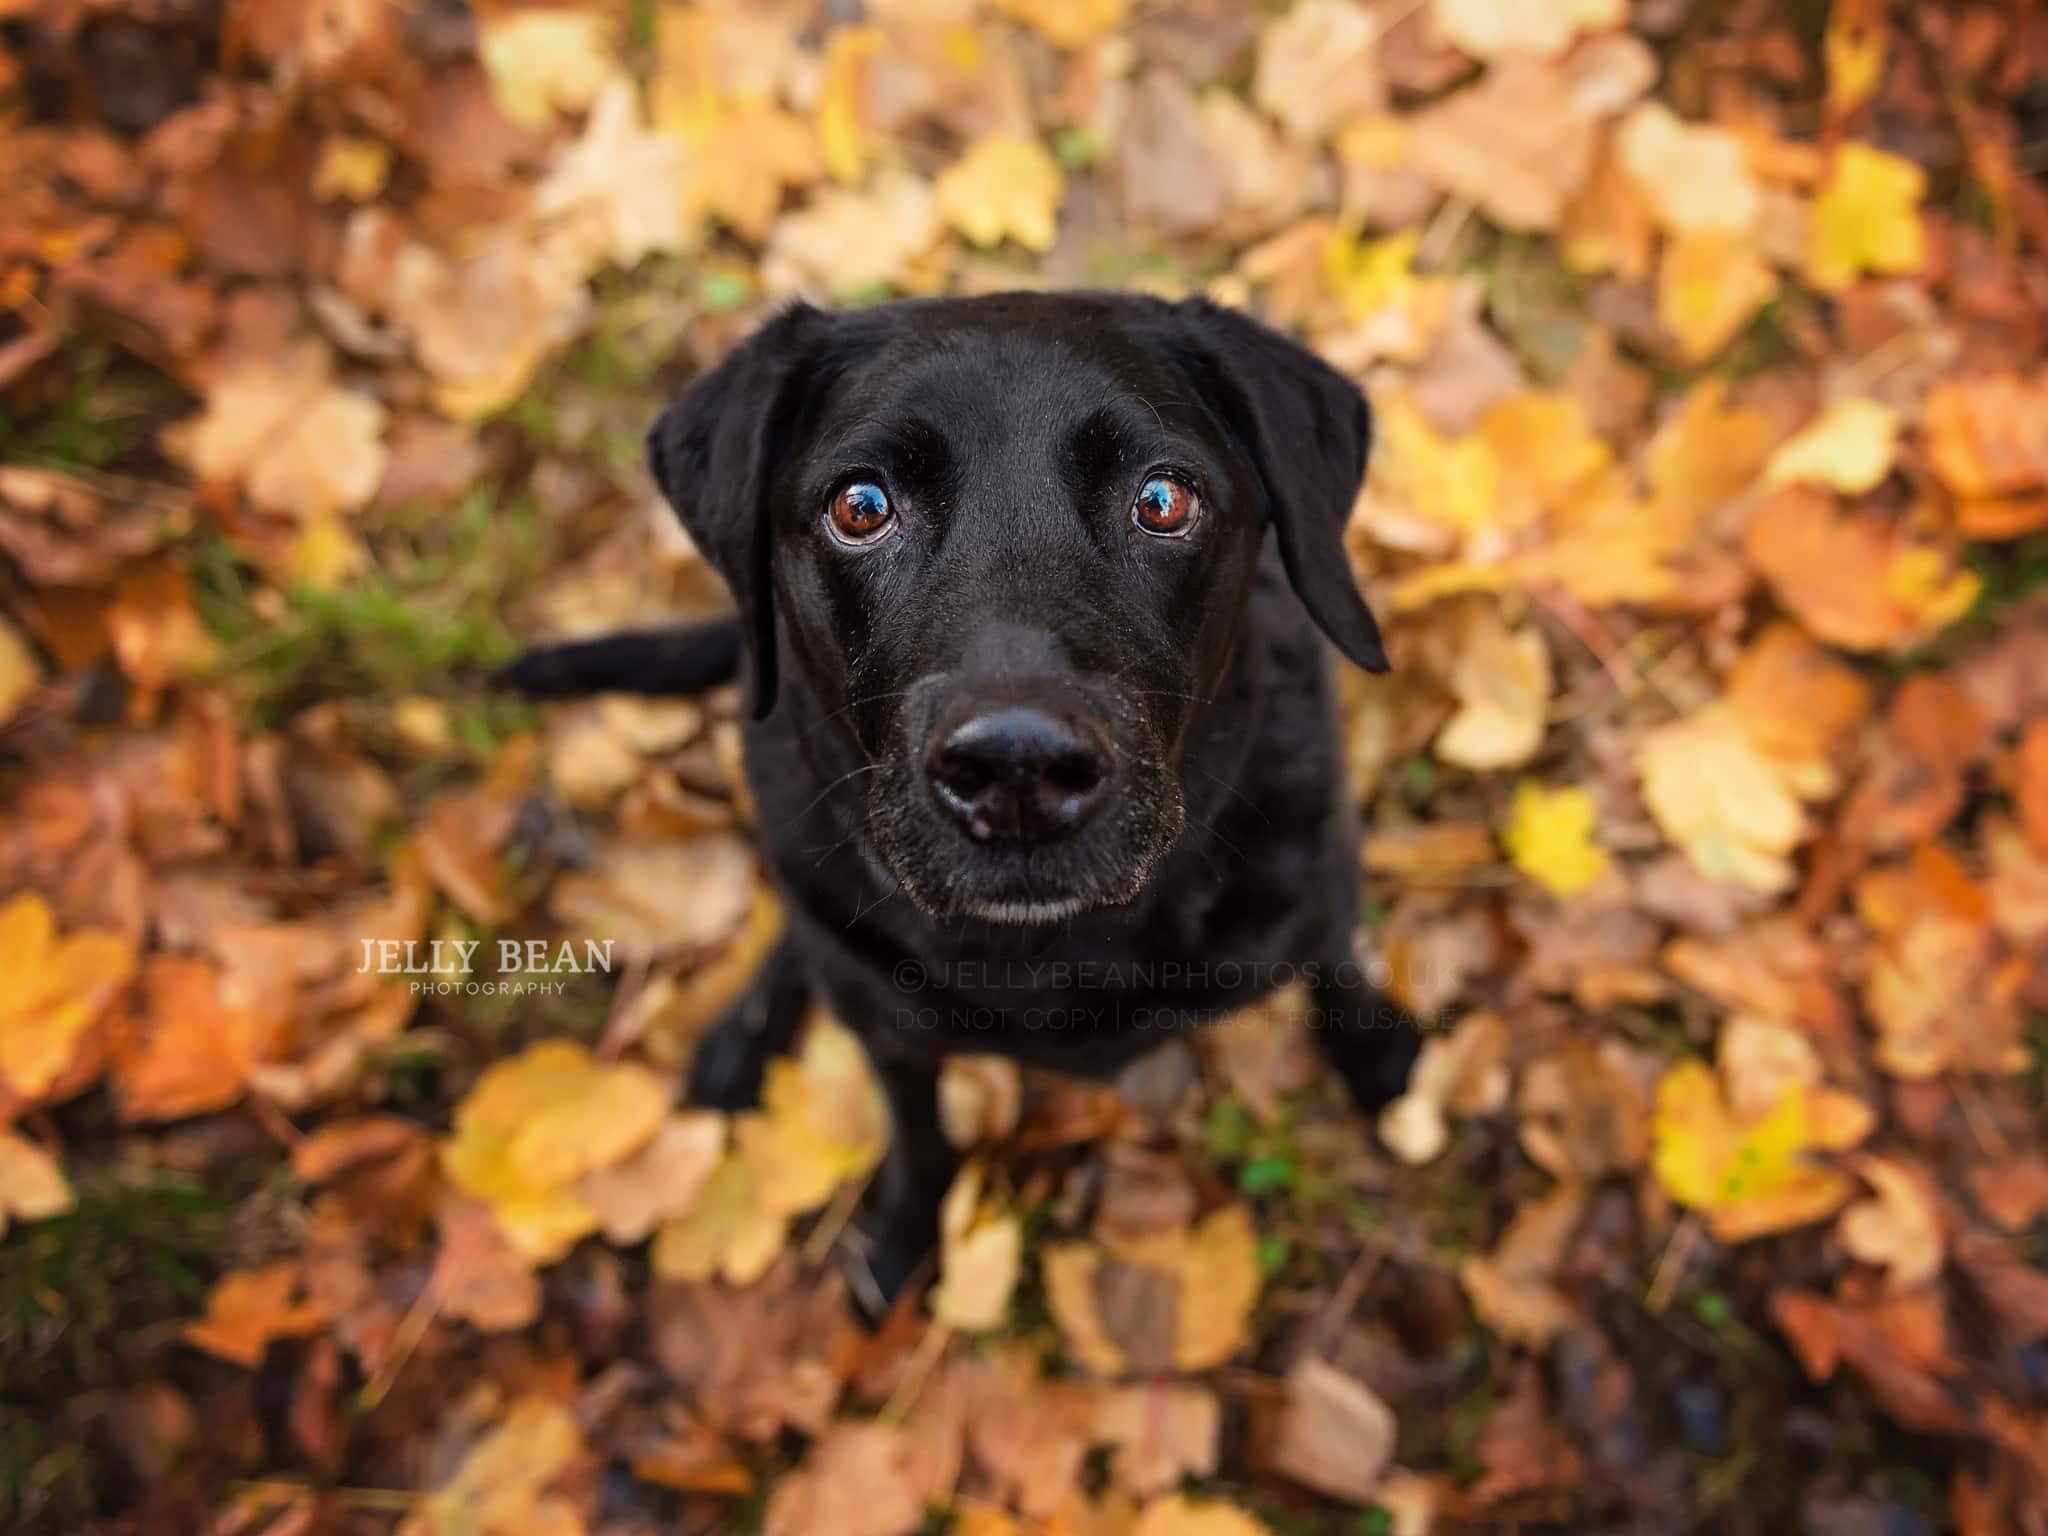 Black Labrador sitting in leaves